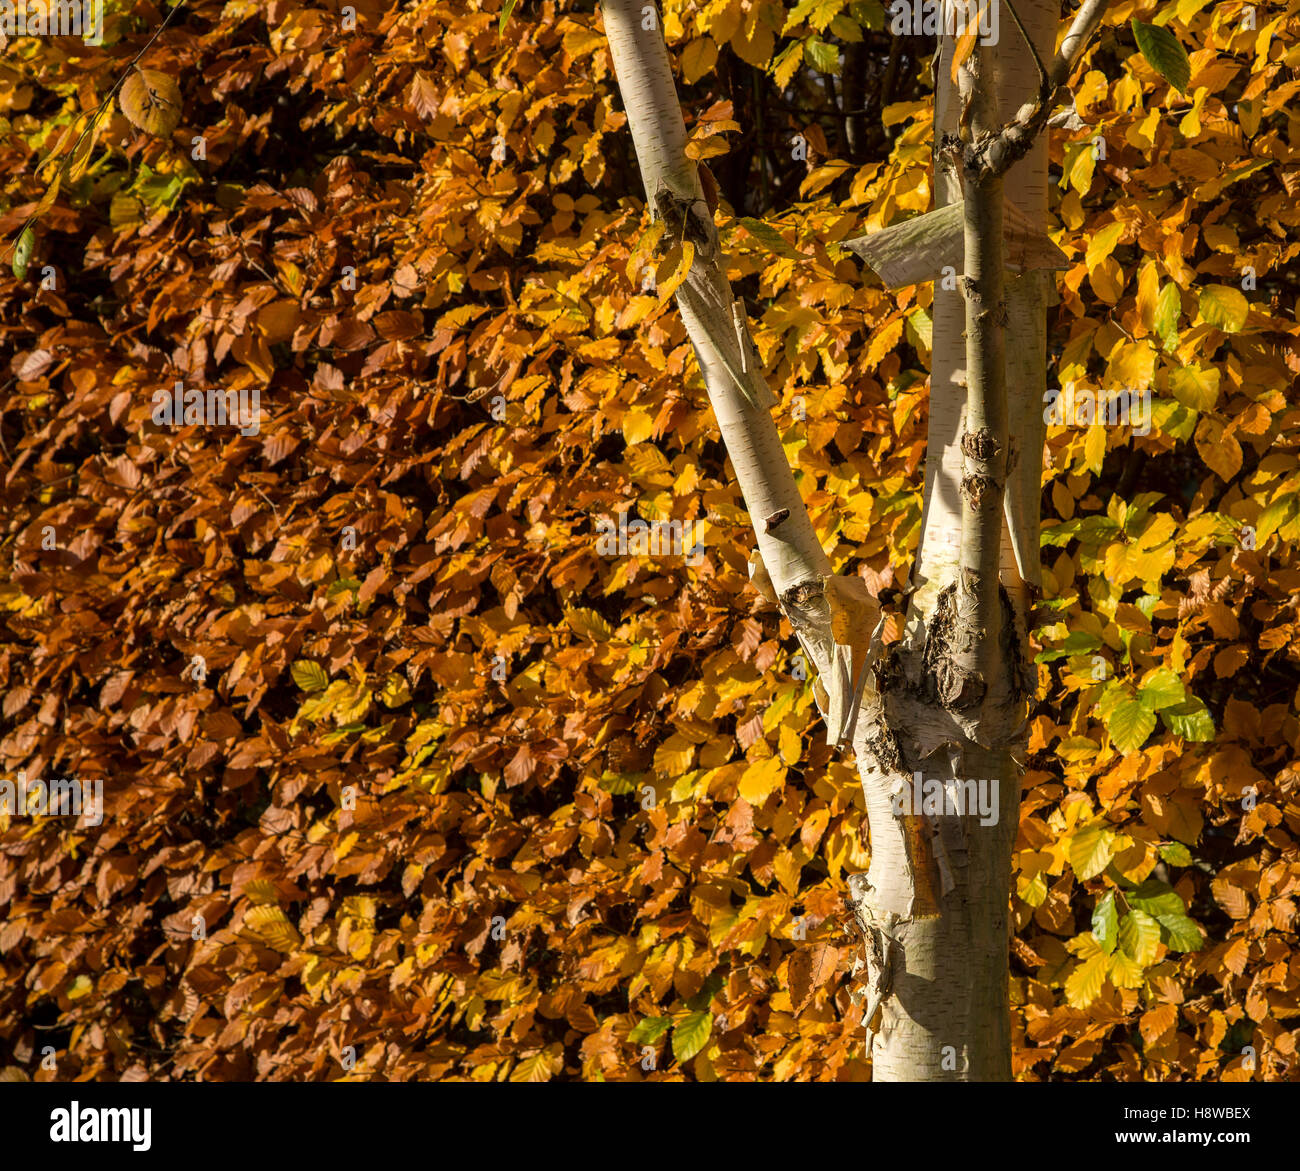 a-common-beech-hedge-in-autumn-fagus-syl